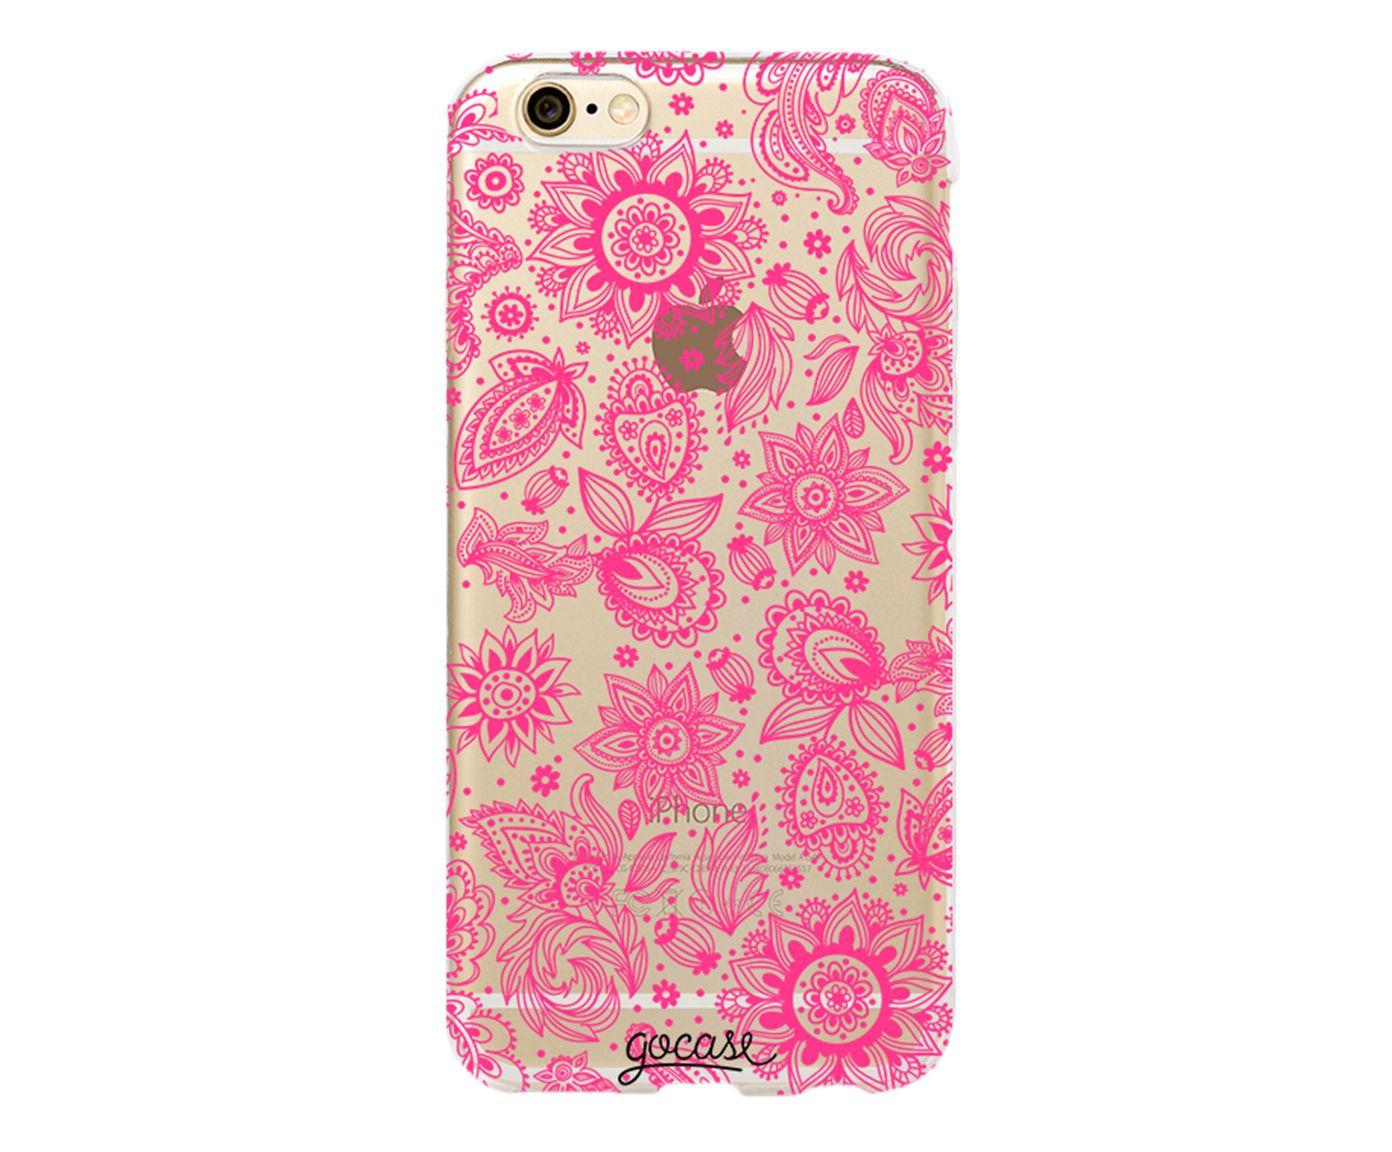 Case Renda Pink - Para iPhone 6/6S   Westwing.com.br